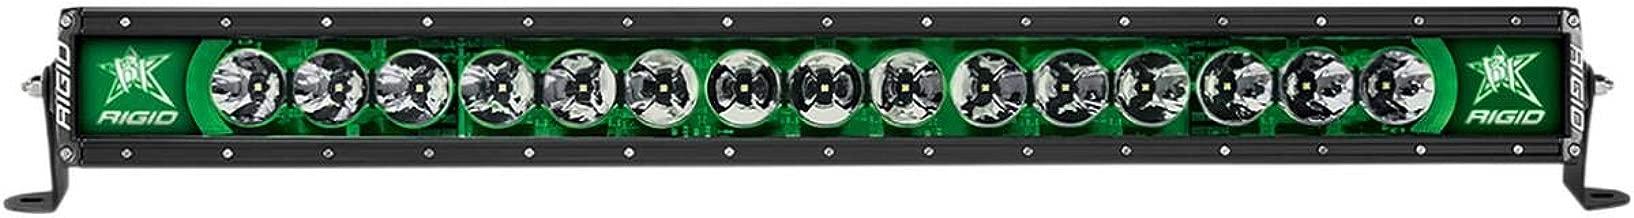 Rigid Industries 230033 Radiance+, 30 Inch, Green Backlight, LED Light Bar Universal